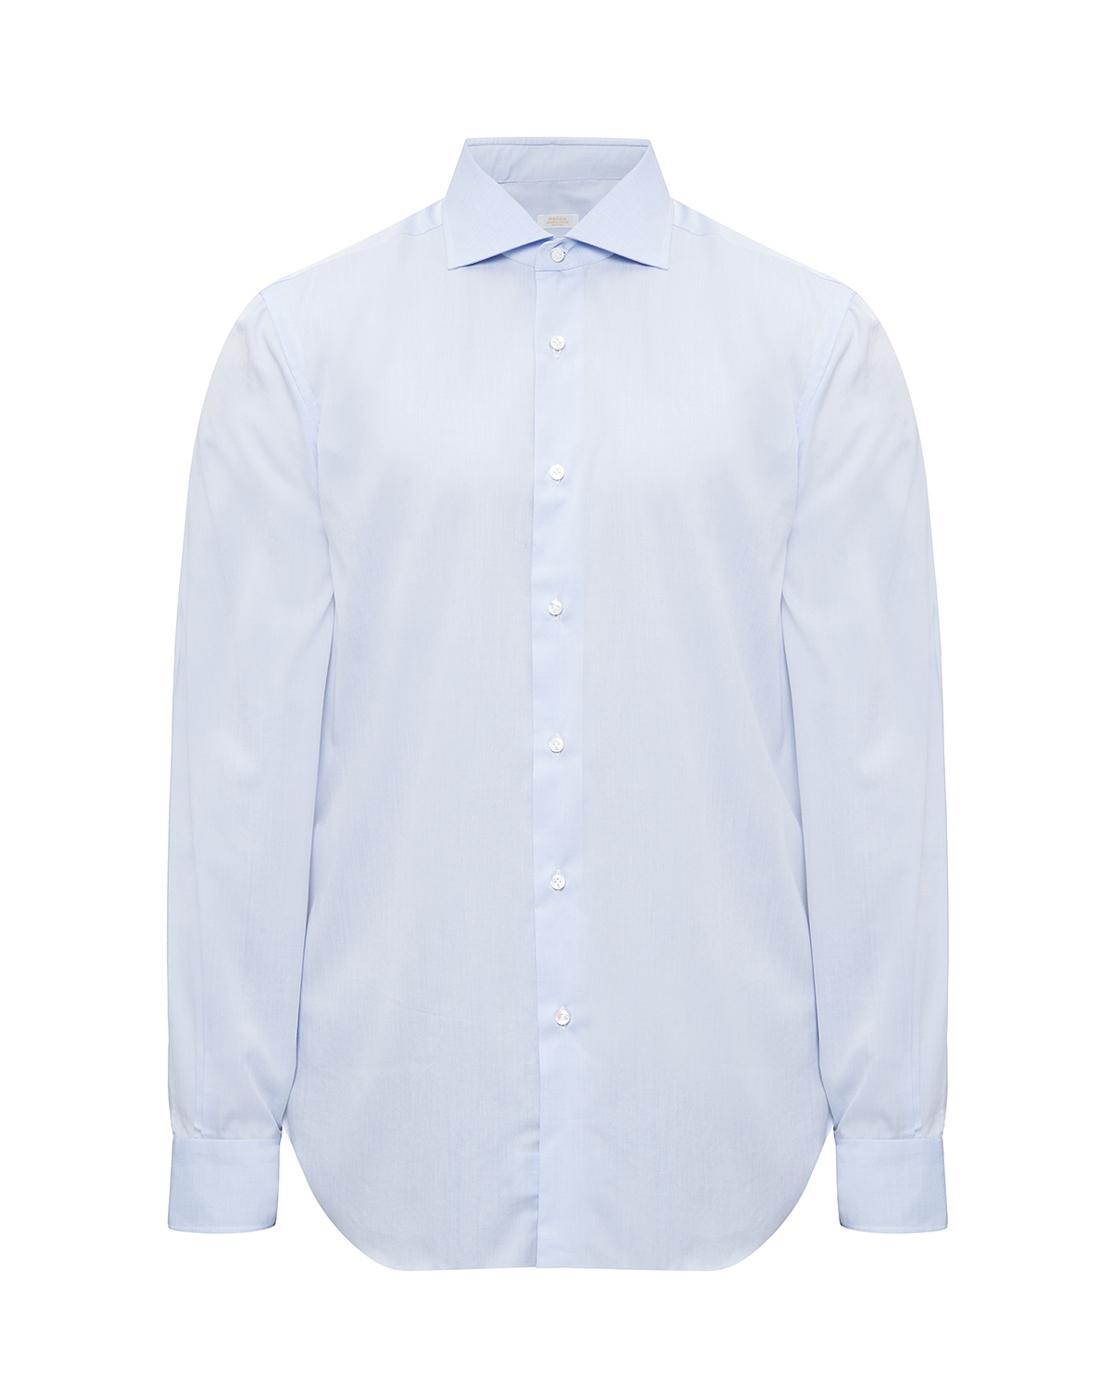 Мужская голубая рубашка Barba SD2U634540303U-1